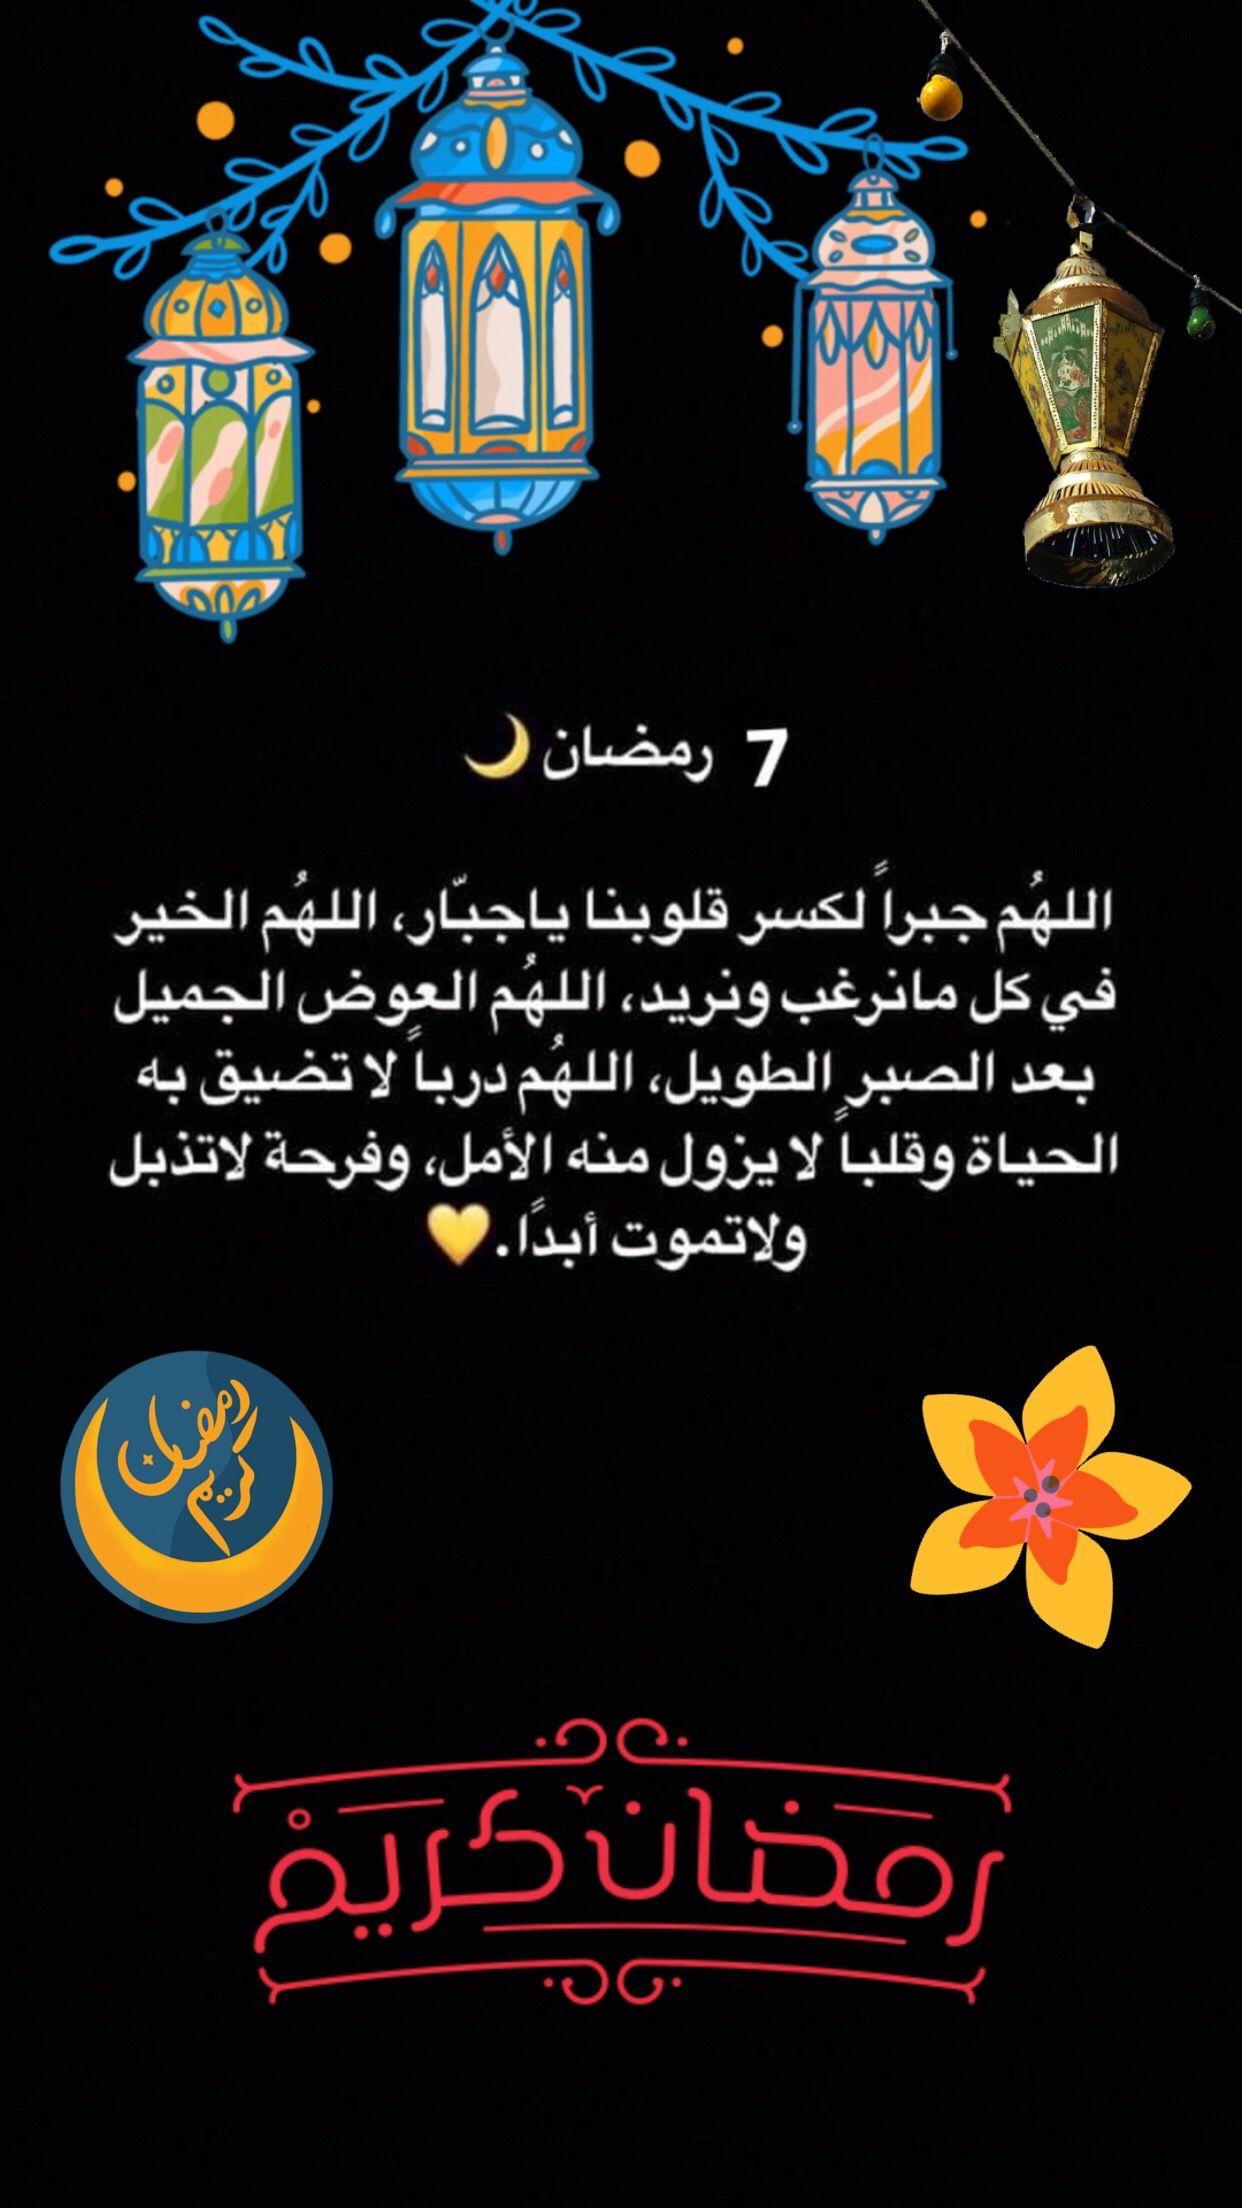 Pin By Shine22 On Days Ramadan Prayer Ramadan Day Ramadan Greetings